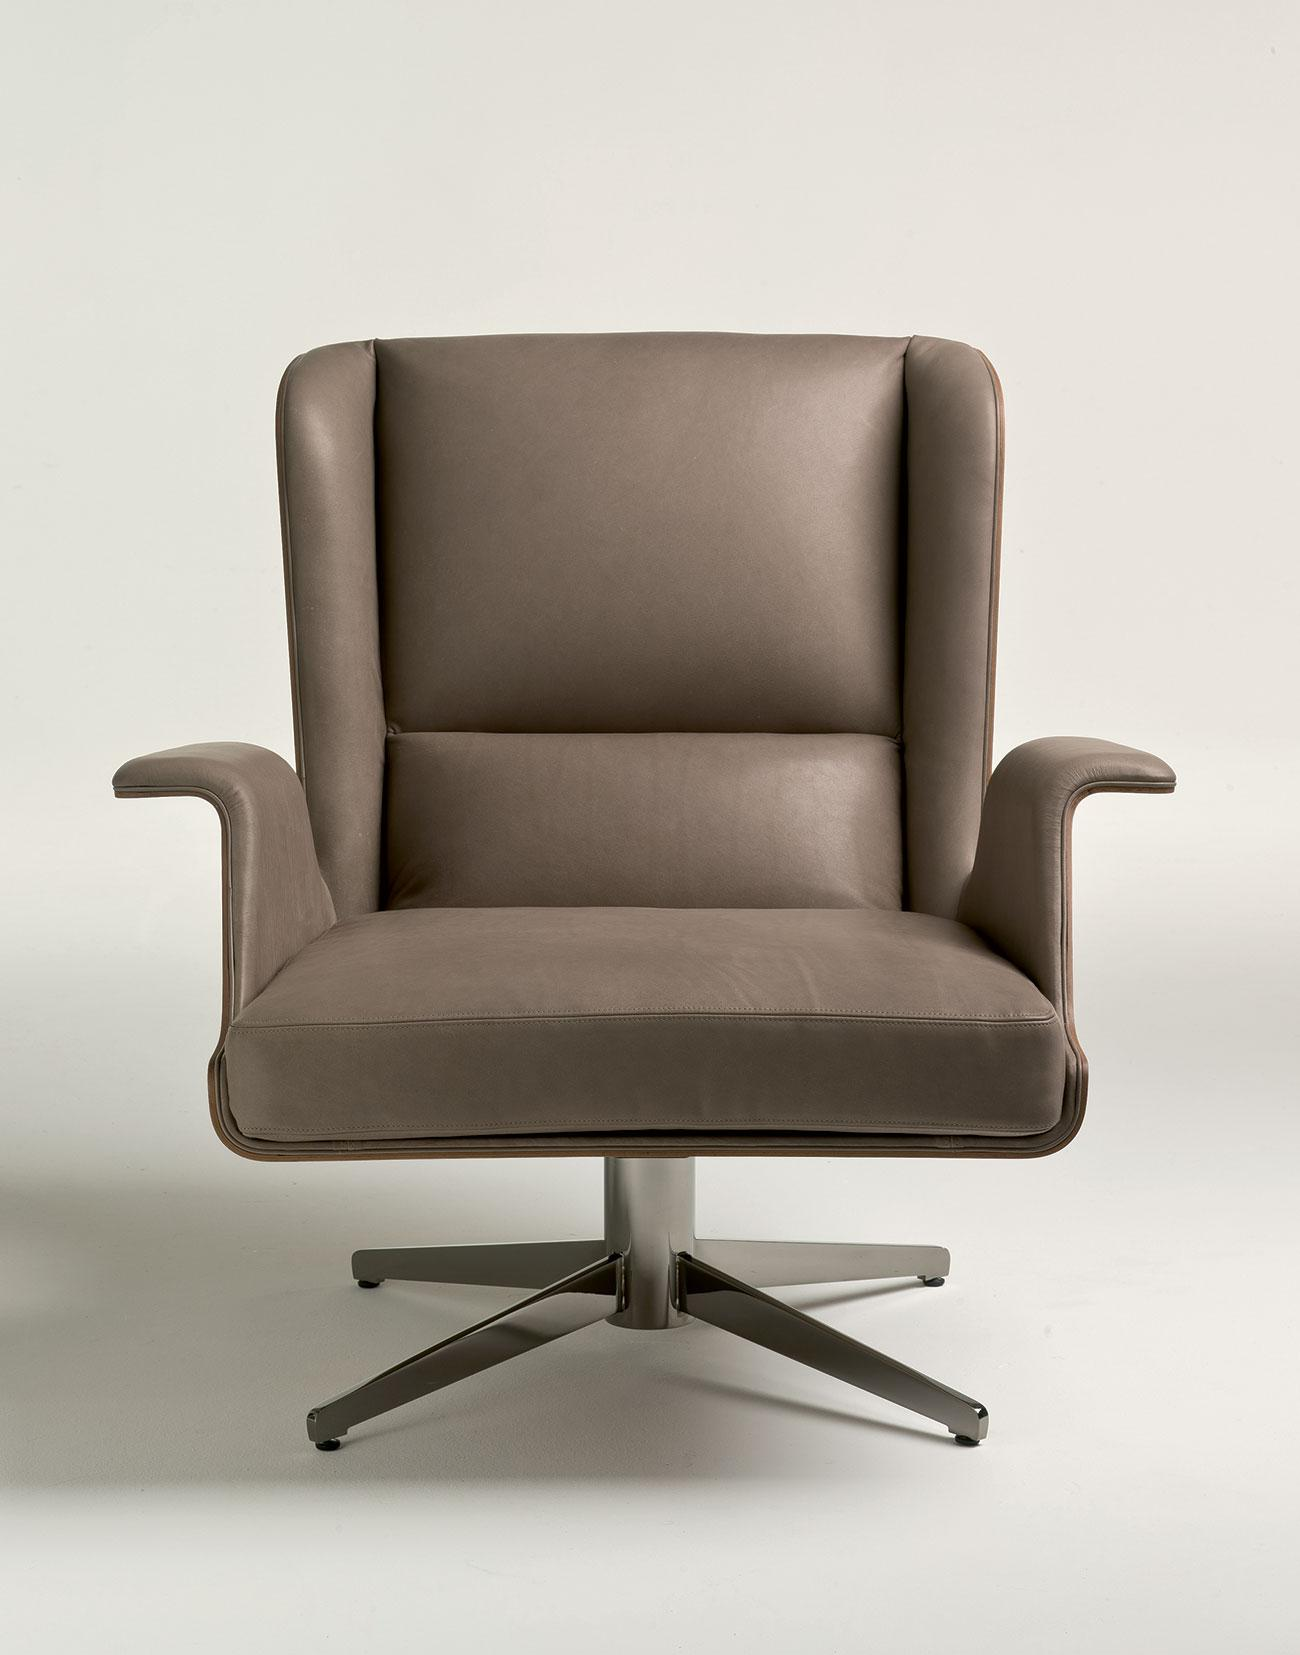 Stunning Poltrone Design Prezzi Images - Ameripest.us - ameripest.us